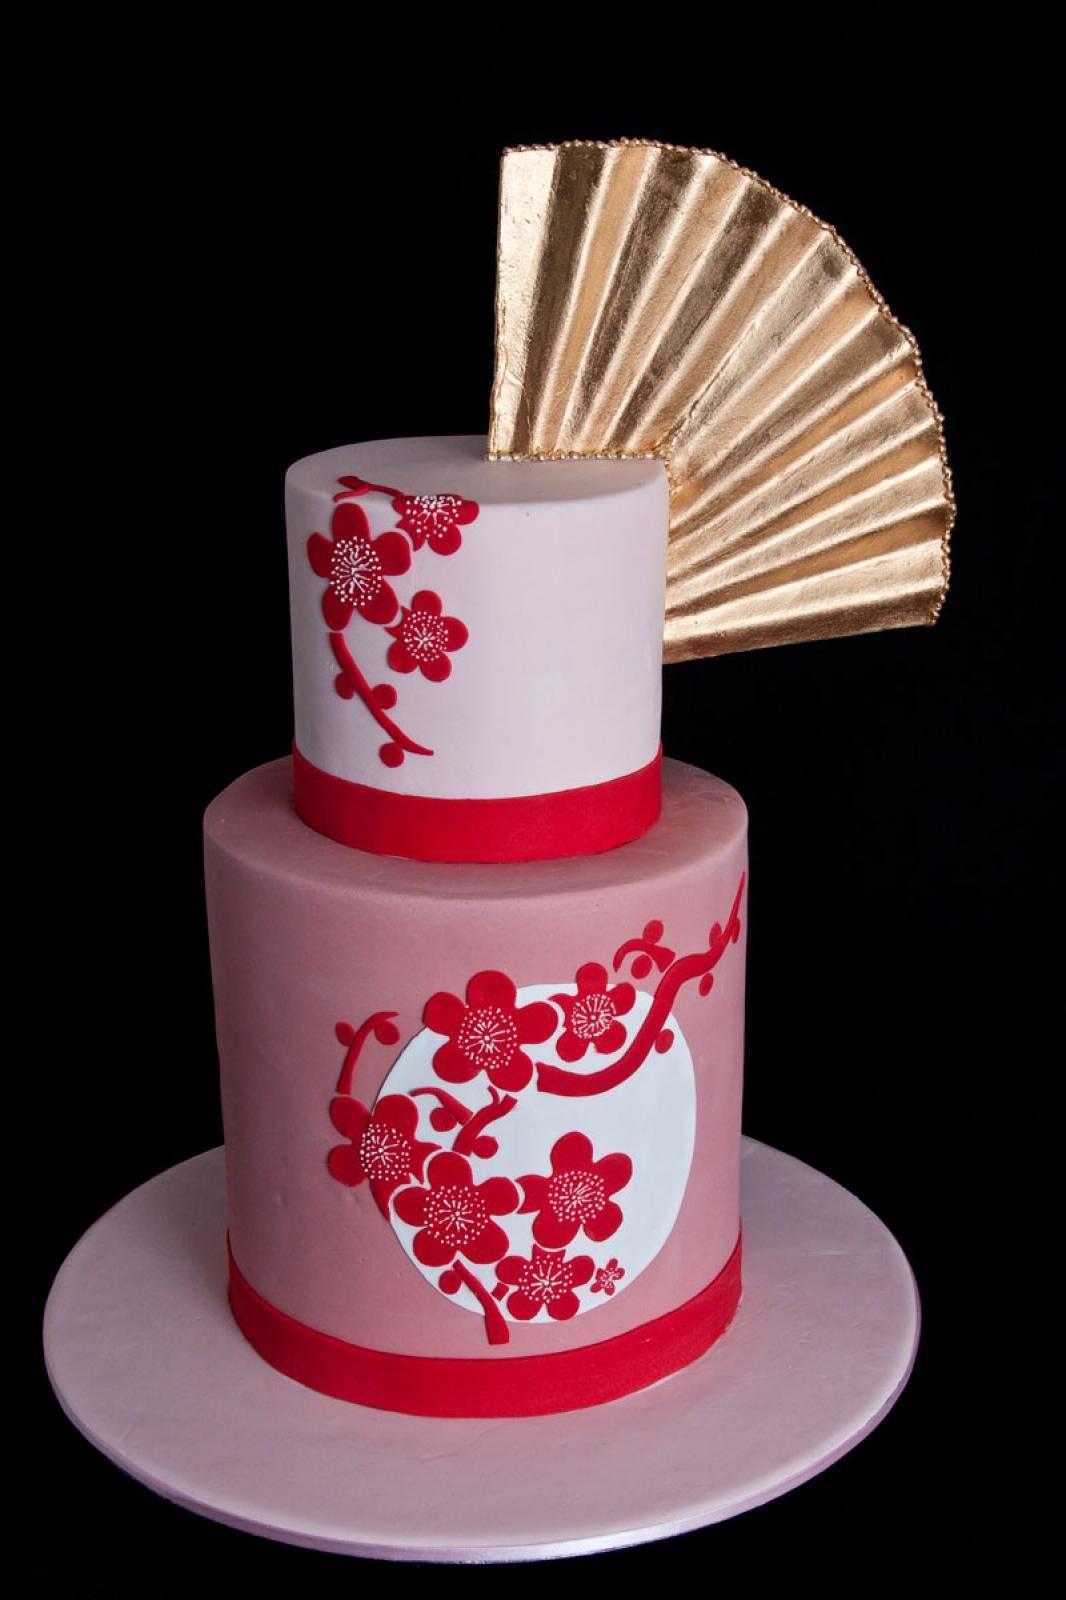 japanese anime cakes Wedding Cake Gallery Anime cake